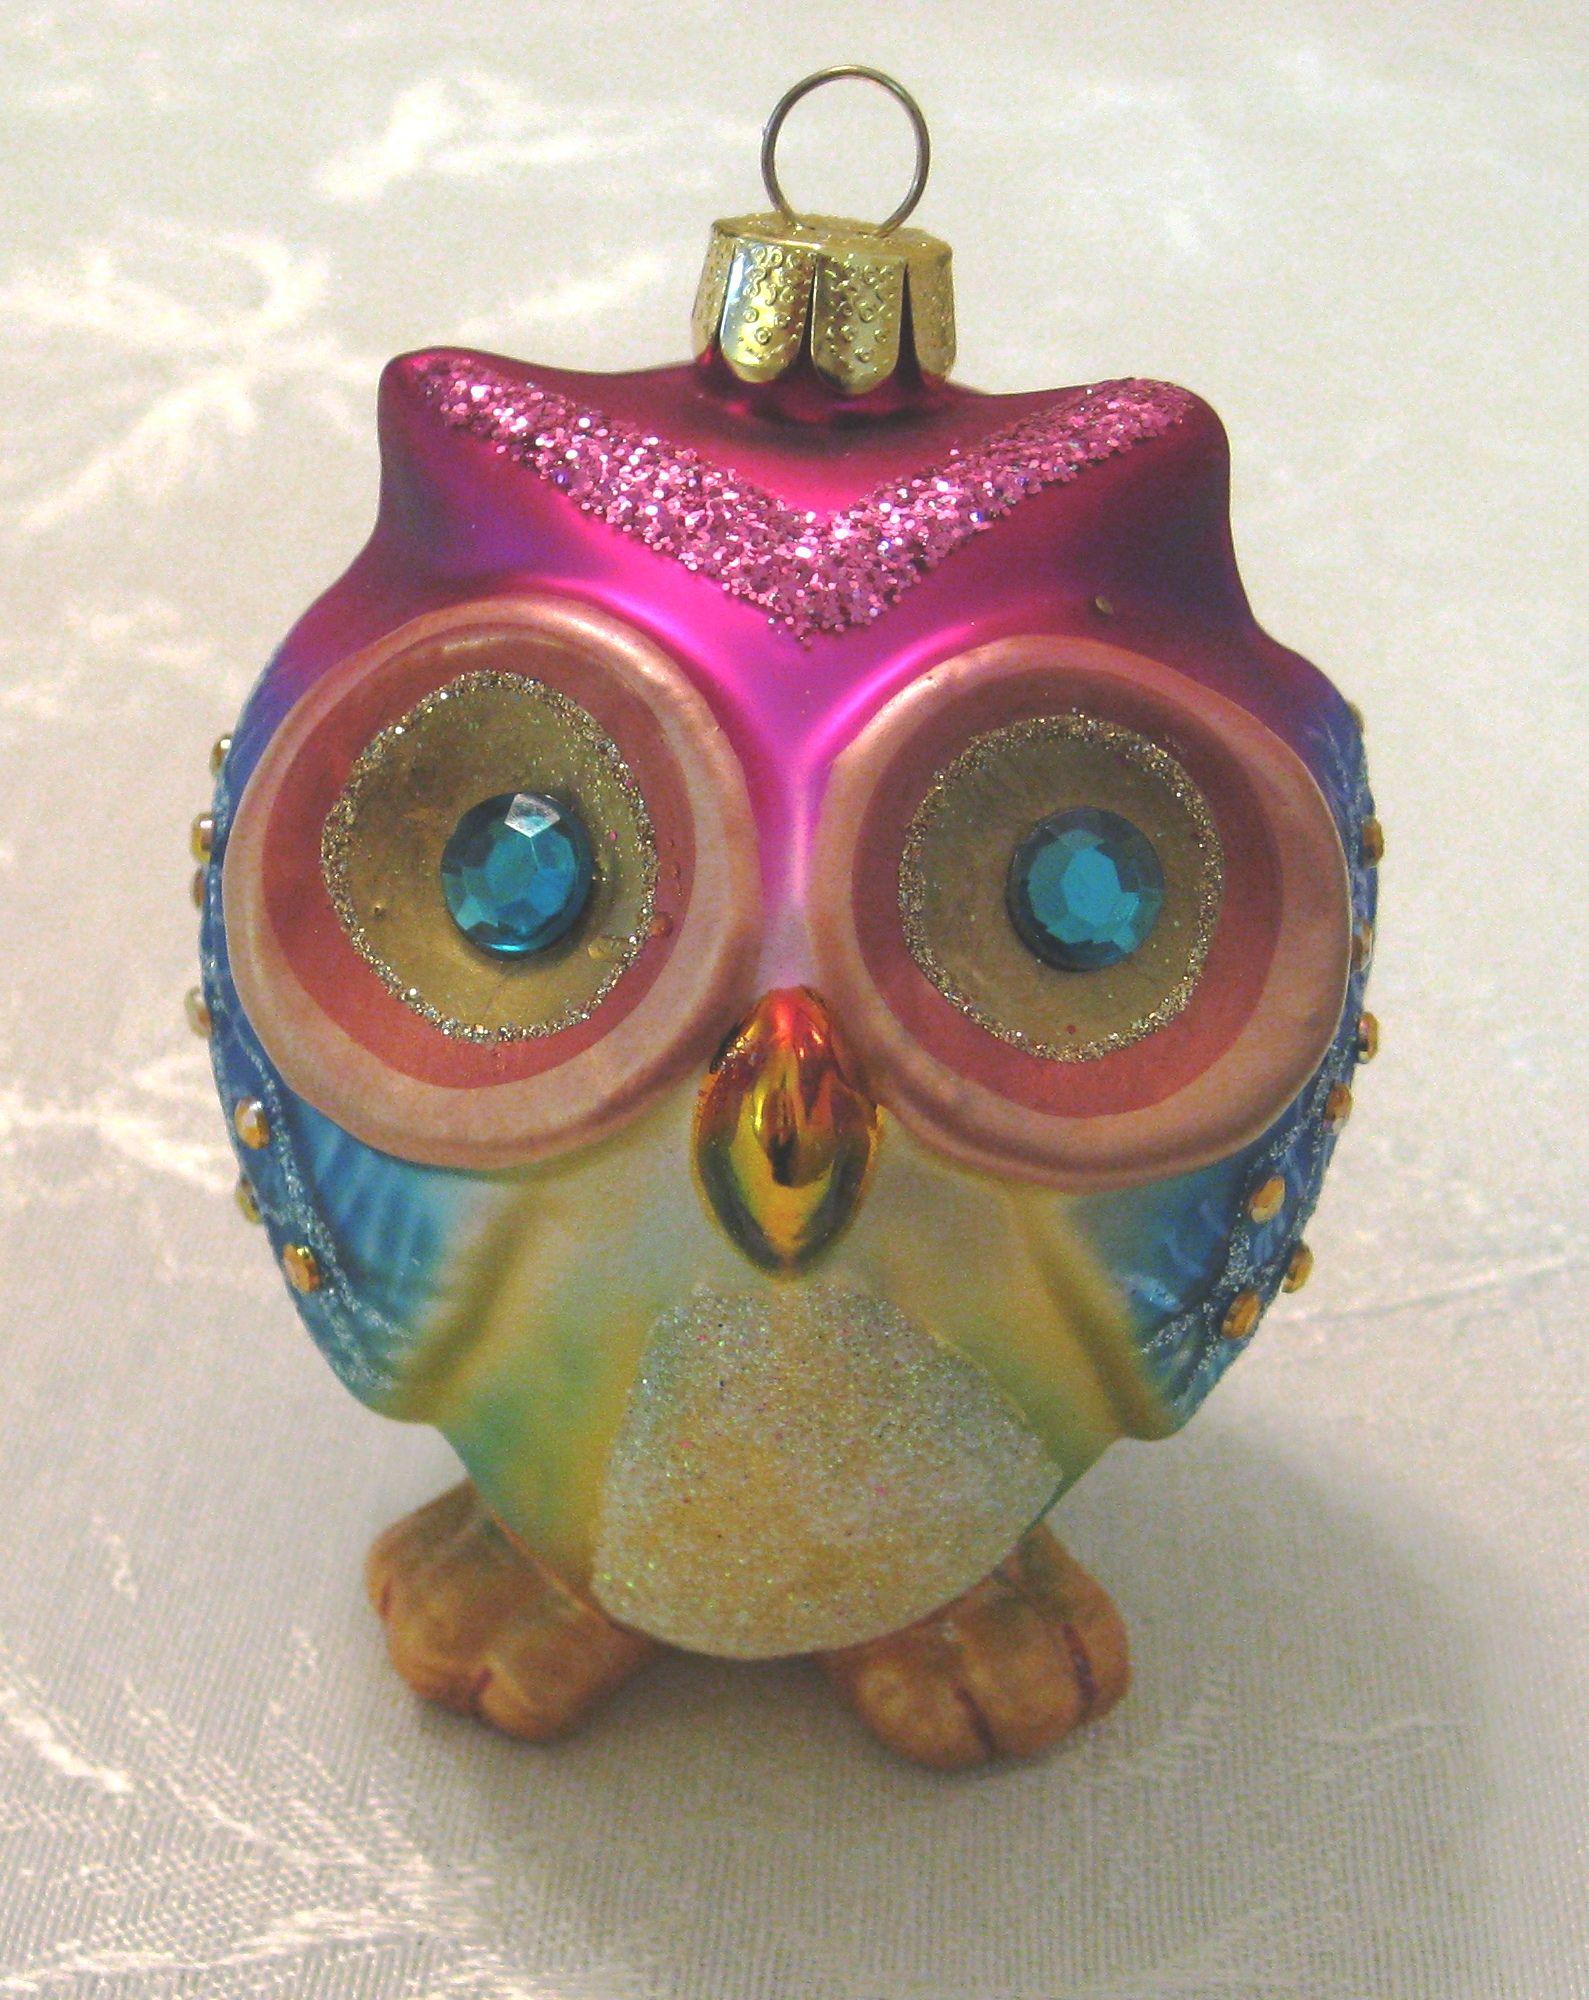 Vintage Christmas Ornament ~ Colorful Glass Owl Ornament